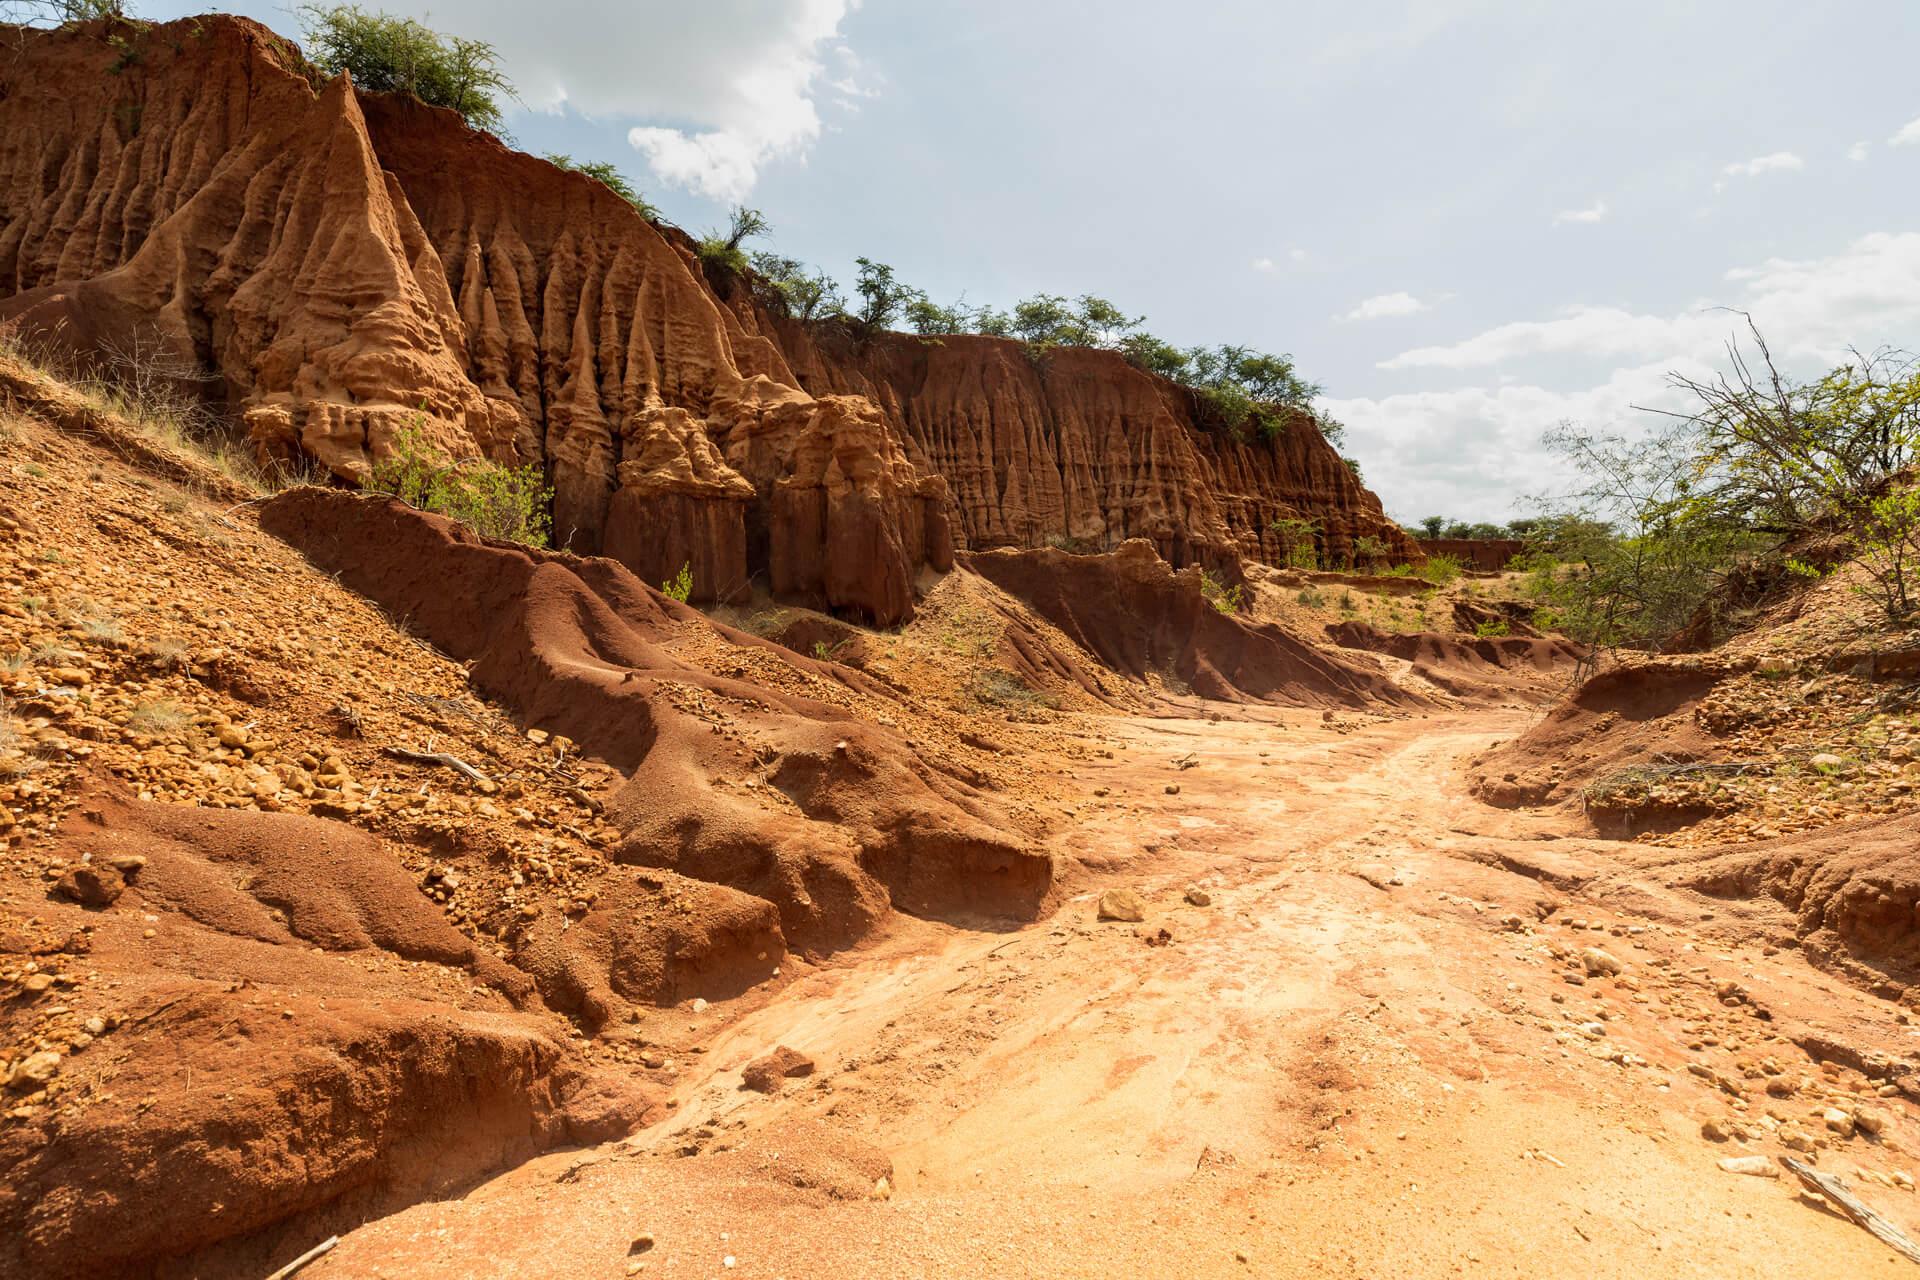 Ethiopia-traveling-Yabelo-can